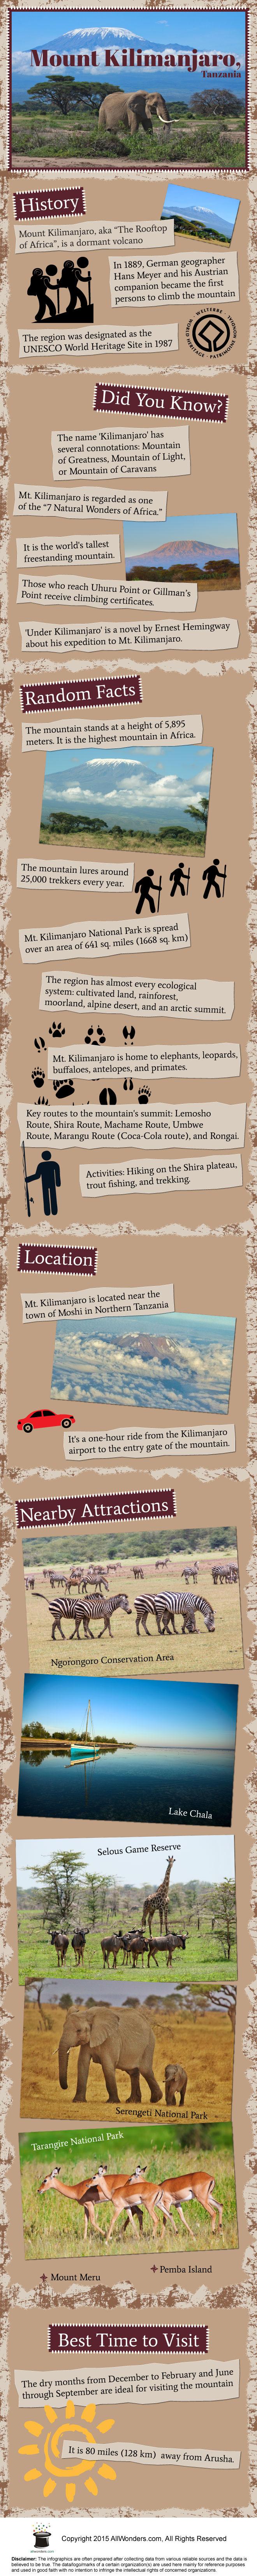 Mount Kilimanjaro Infographic